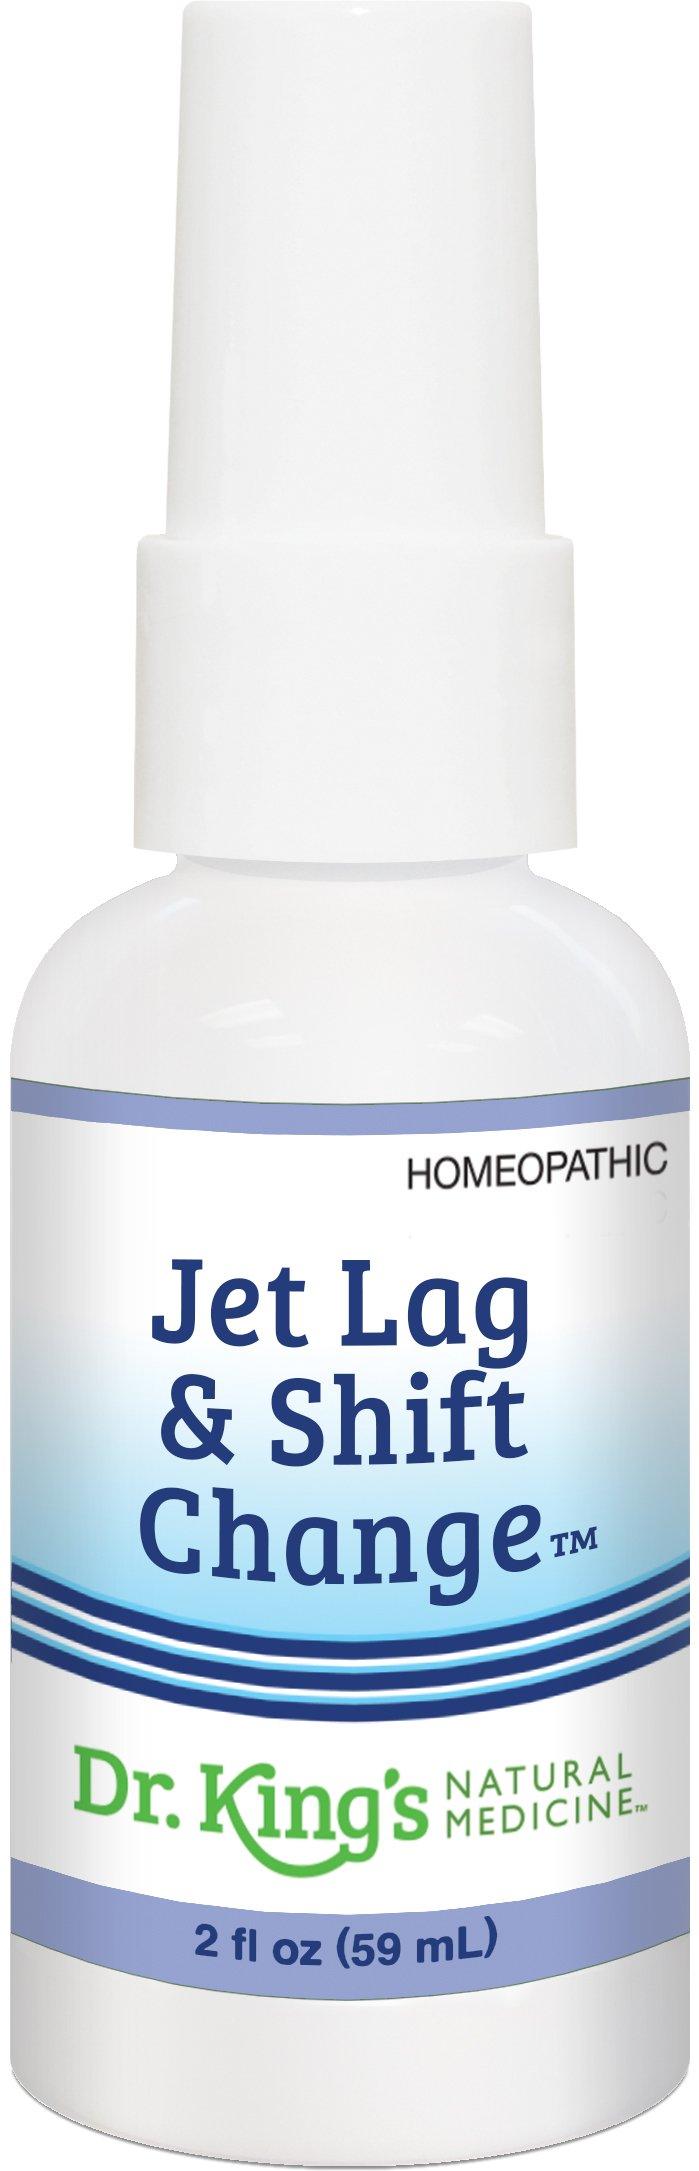 Dr. King's Natural Medicine Jet Lag and Shift Change, 2 Fluid Ounce